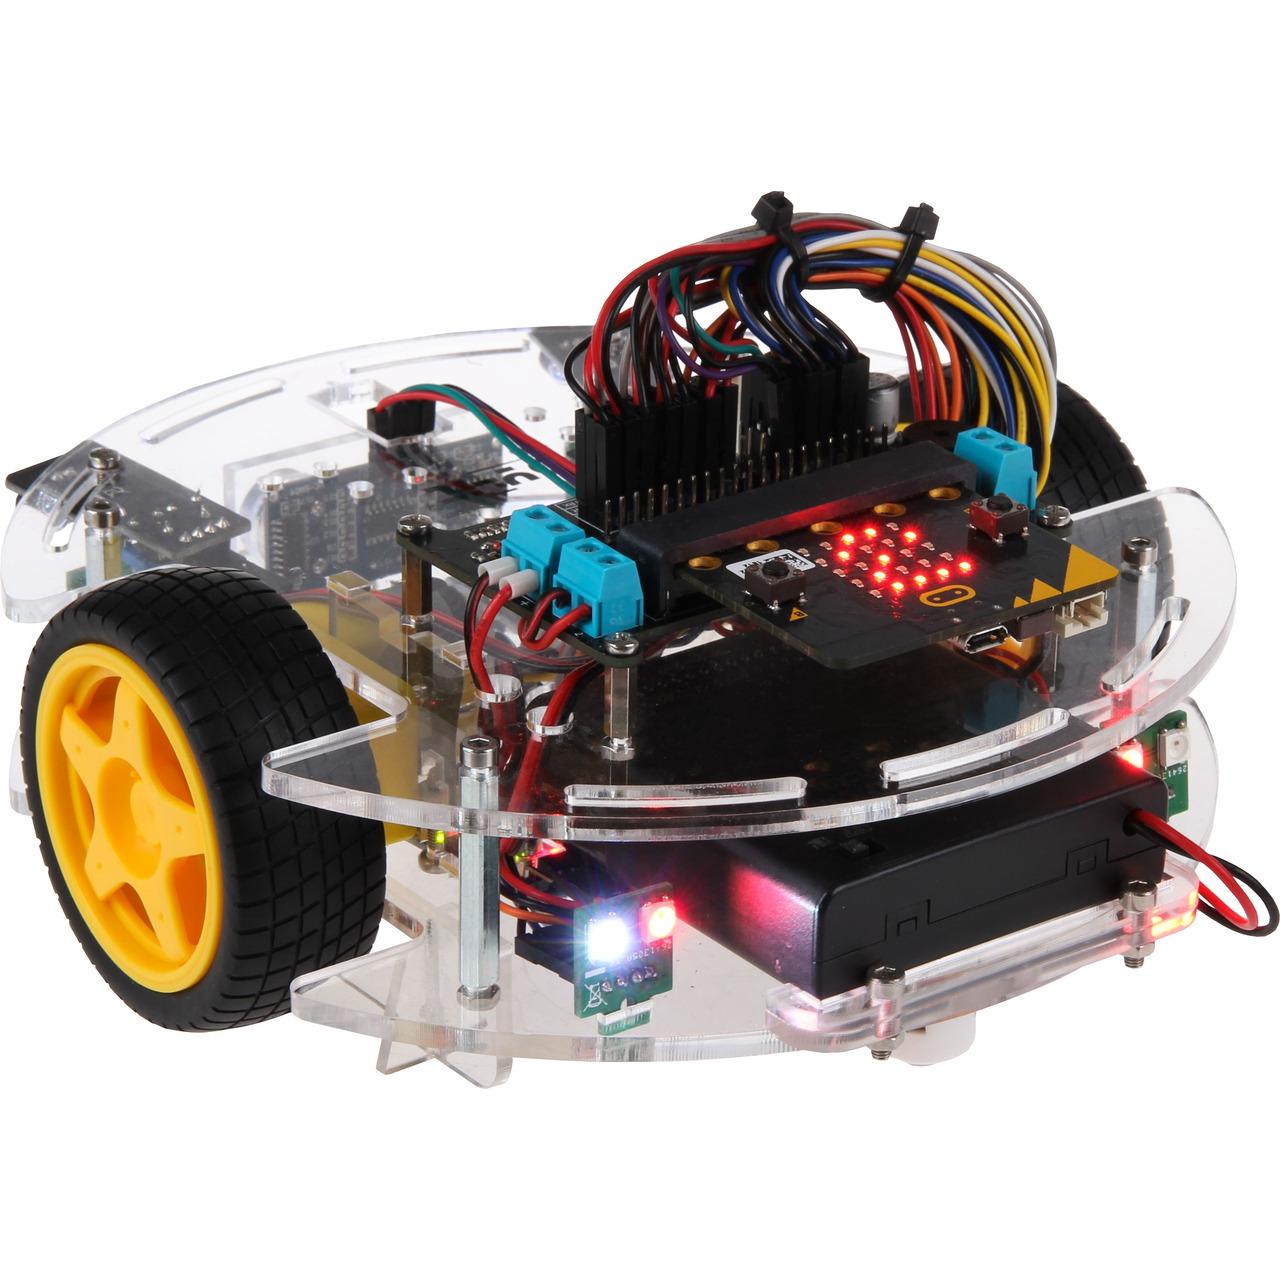 Joy-IT programmierbares Roboterauto Joy-Car- BBC micro:bit